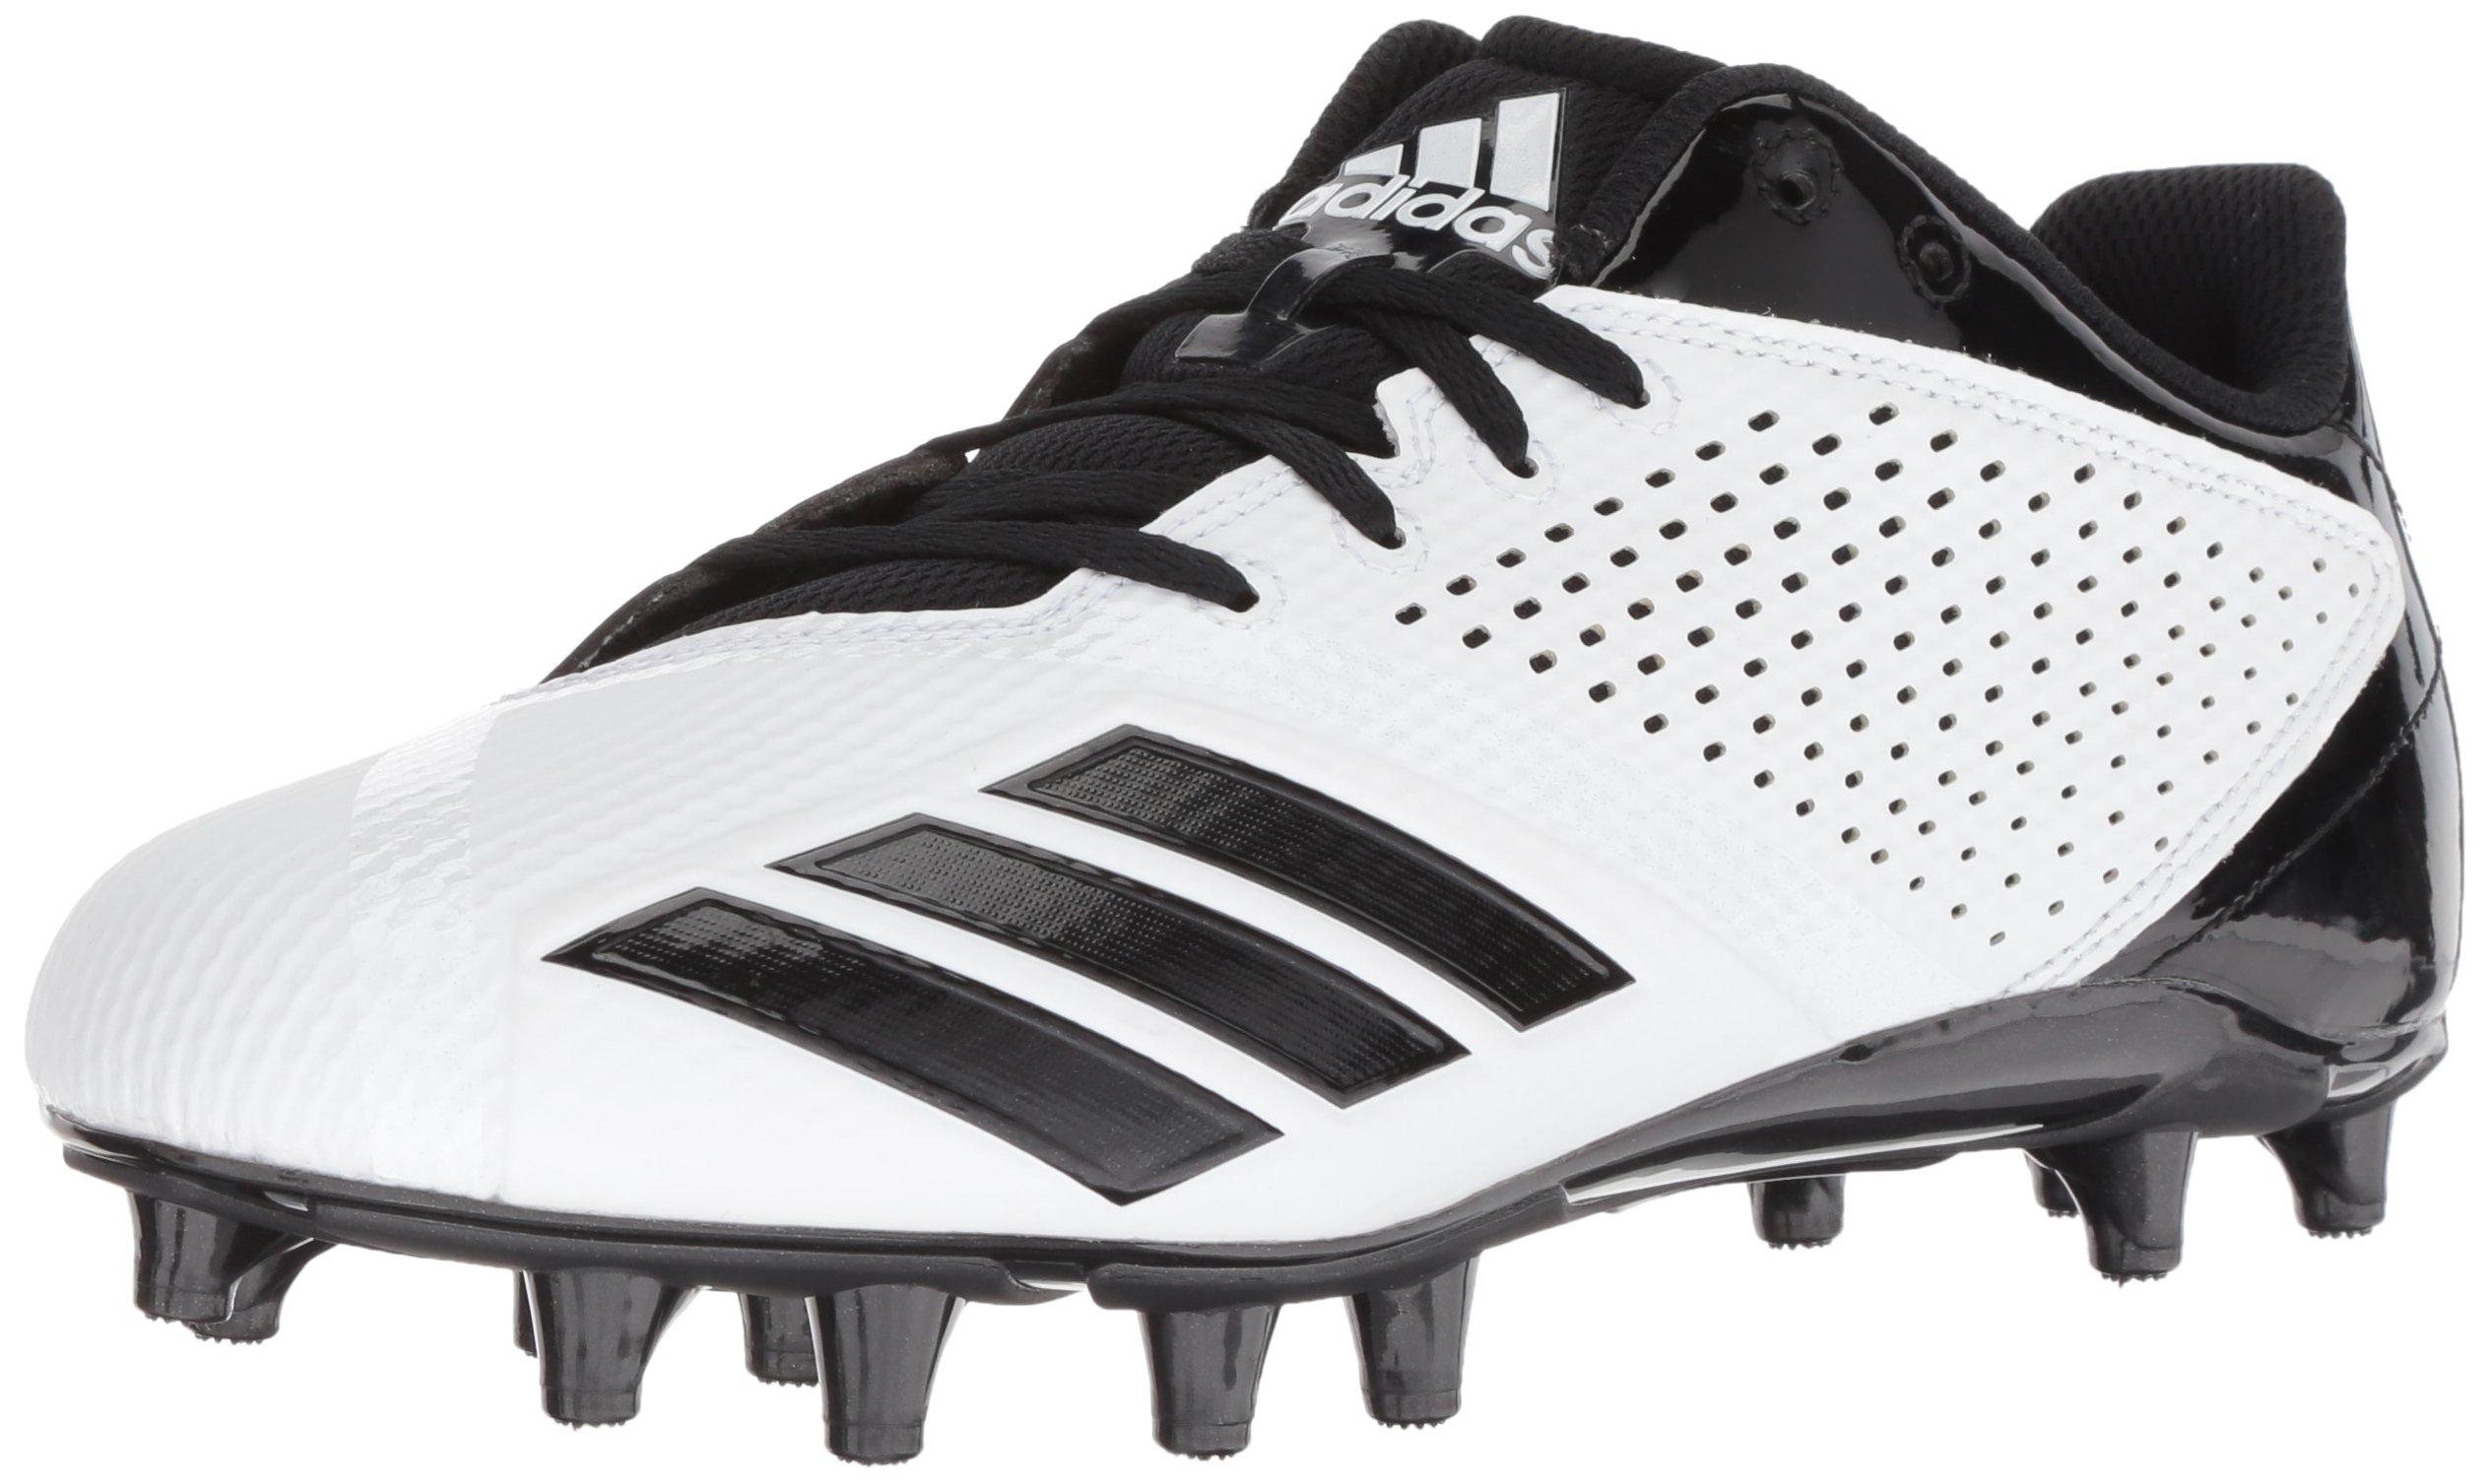 pretty nice be7be 86817 Galleon - Adidas Mens Freak X Carbon Mid Football Shoe, White Black, 9 M US